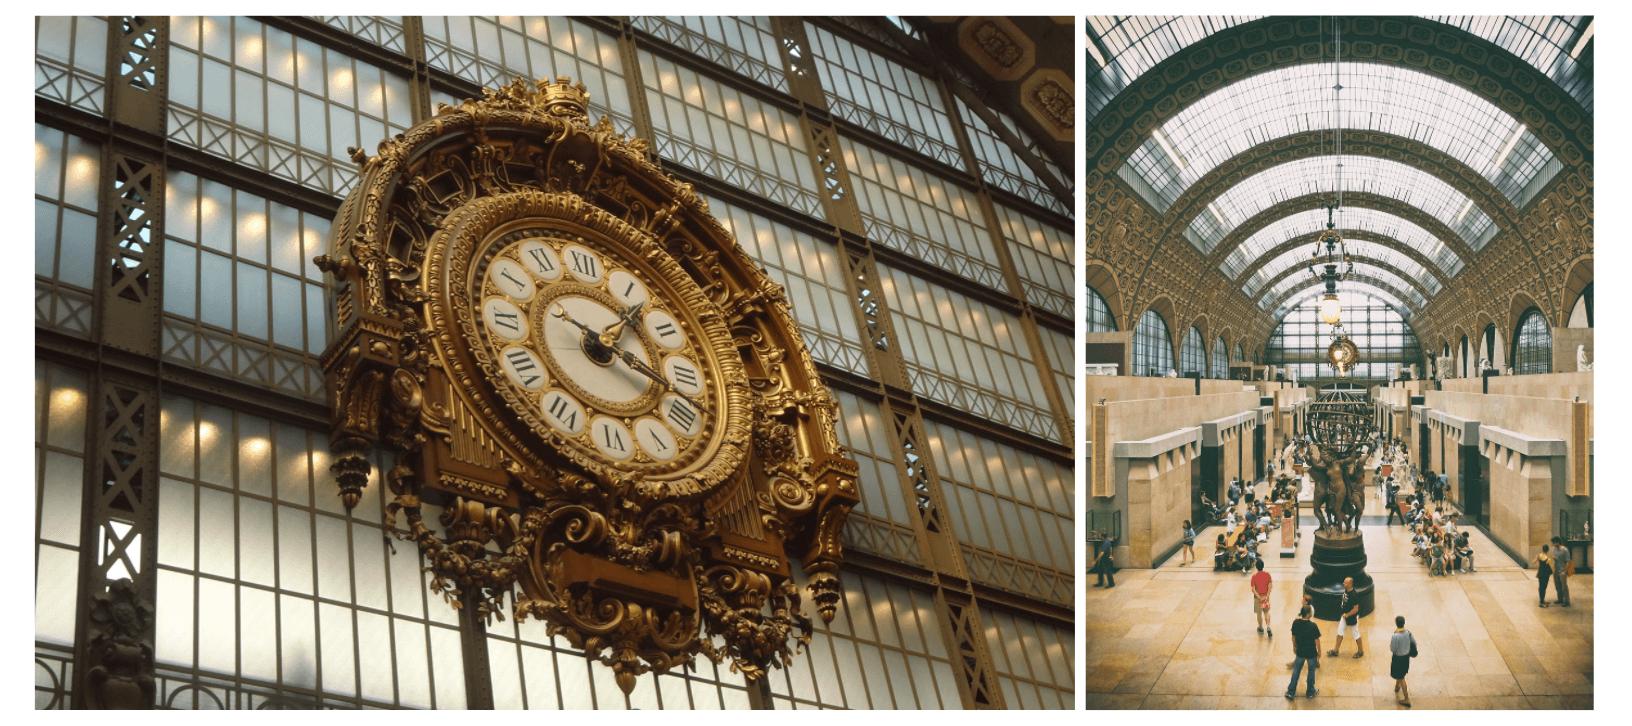 museus-em-paris-orsay